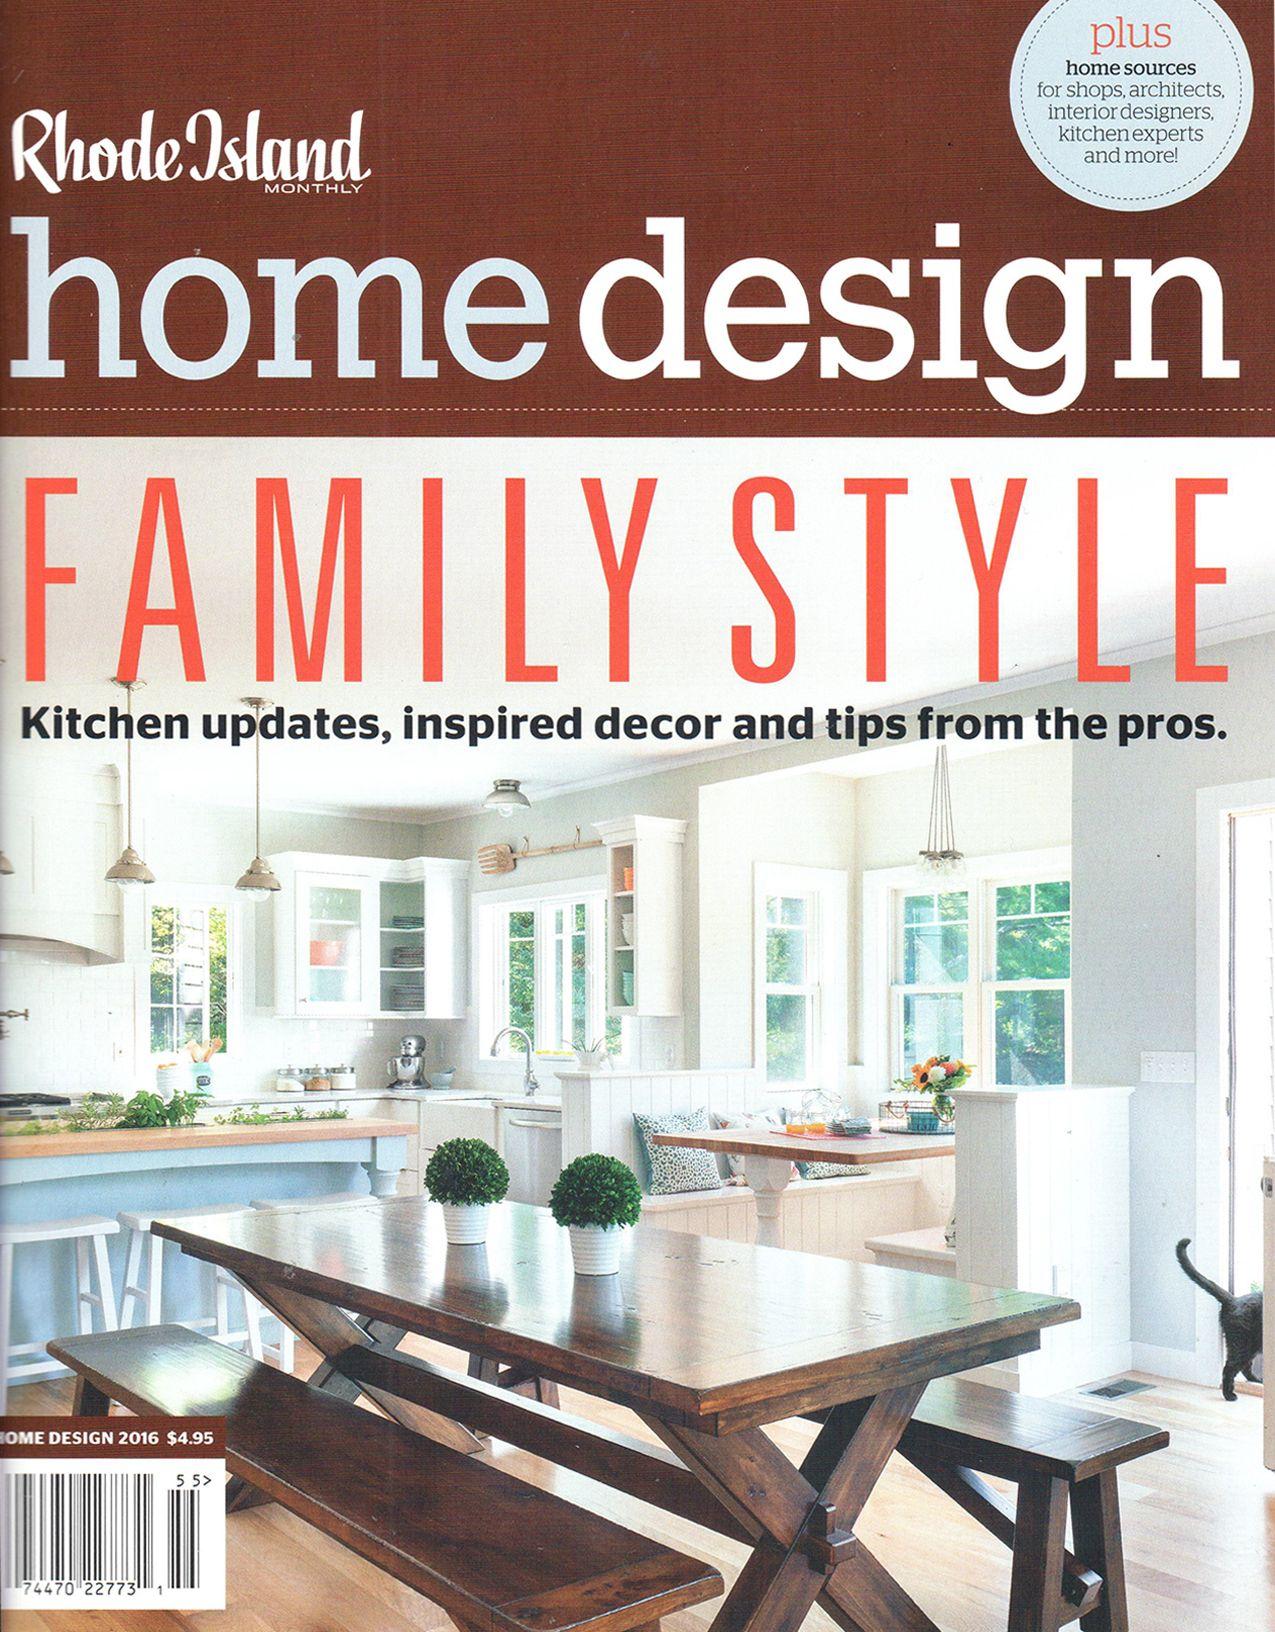 rhode island home design features studio dunn s contemporary rh pinterest ph